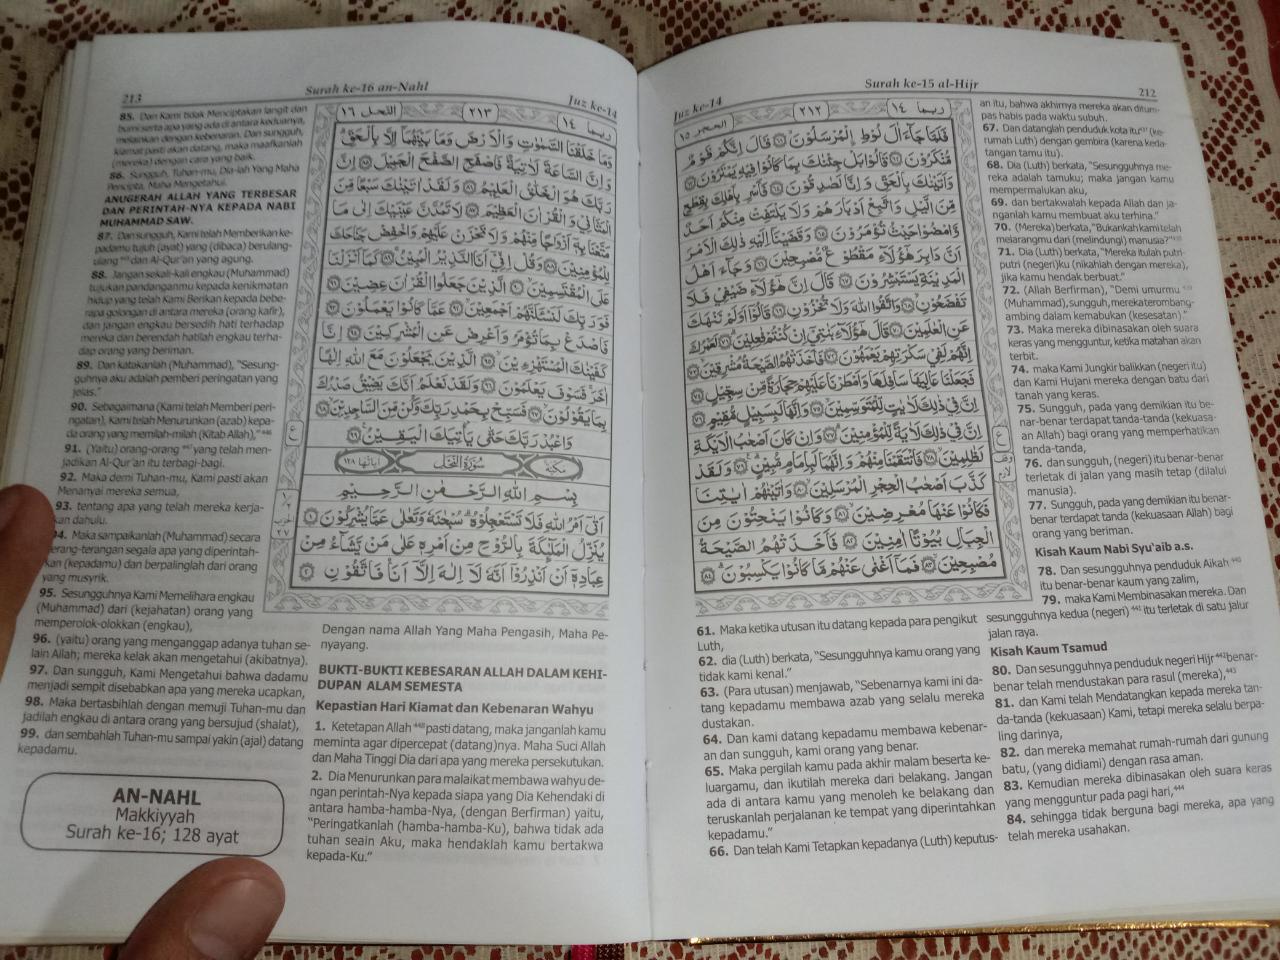 Manfaat-manfaat Membaca Al-Qur'an Selain Sebagai Pedoman Hidup! Kita Wajib Tahu